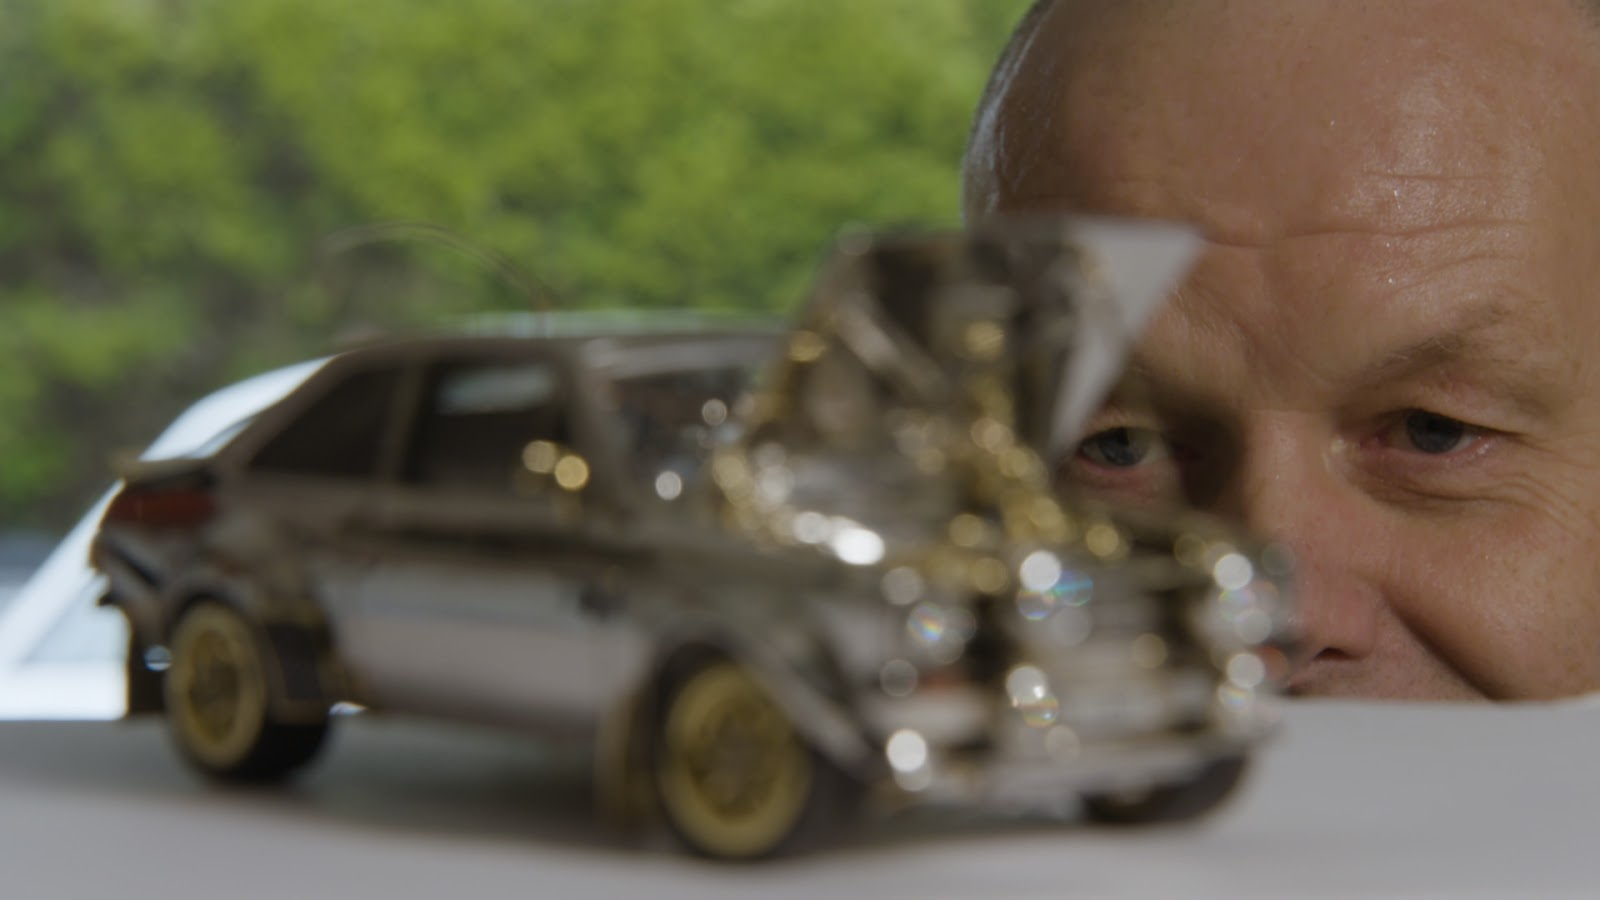 JewelledEscort 04252812529 Ένα Ford Escort Mk2 κατασκευασμένο από χρυσό, διαμάντια και ασήμι! Ari Vatanen, Classic, Ford, Ford Escort, Ford Eskort mk2, video, videos, δημοπρασία